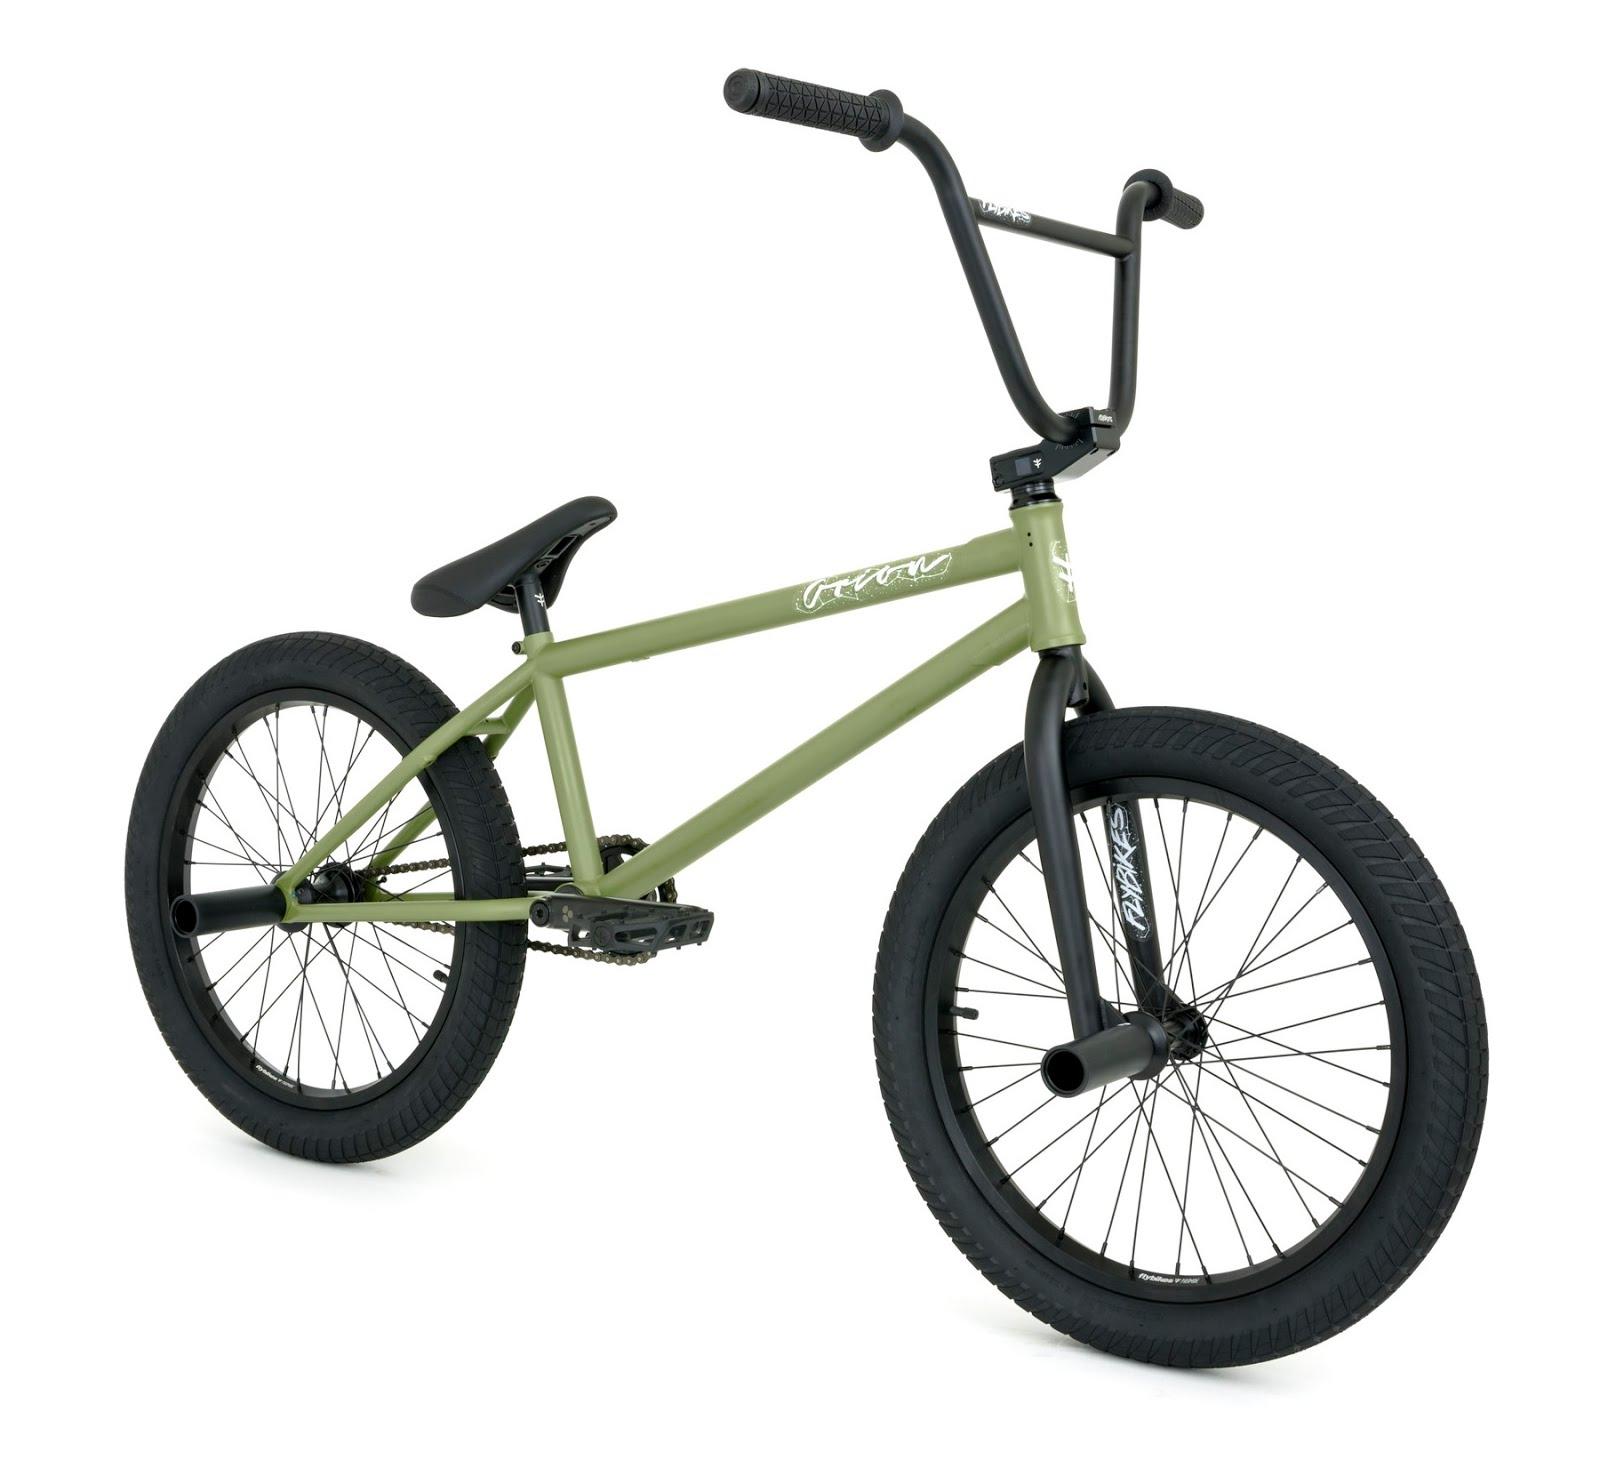 Bicicleta FLYBIKES Orion 2017 $2'150.000